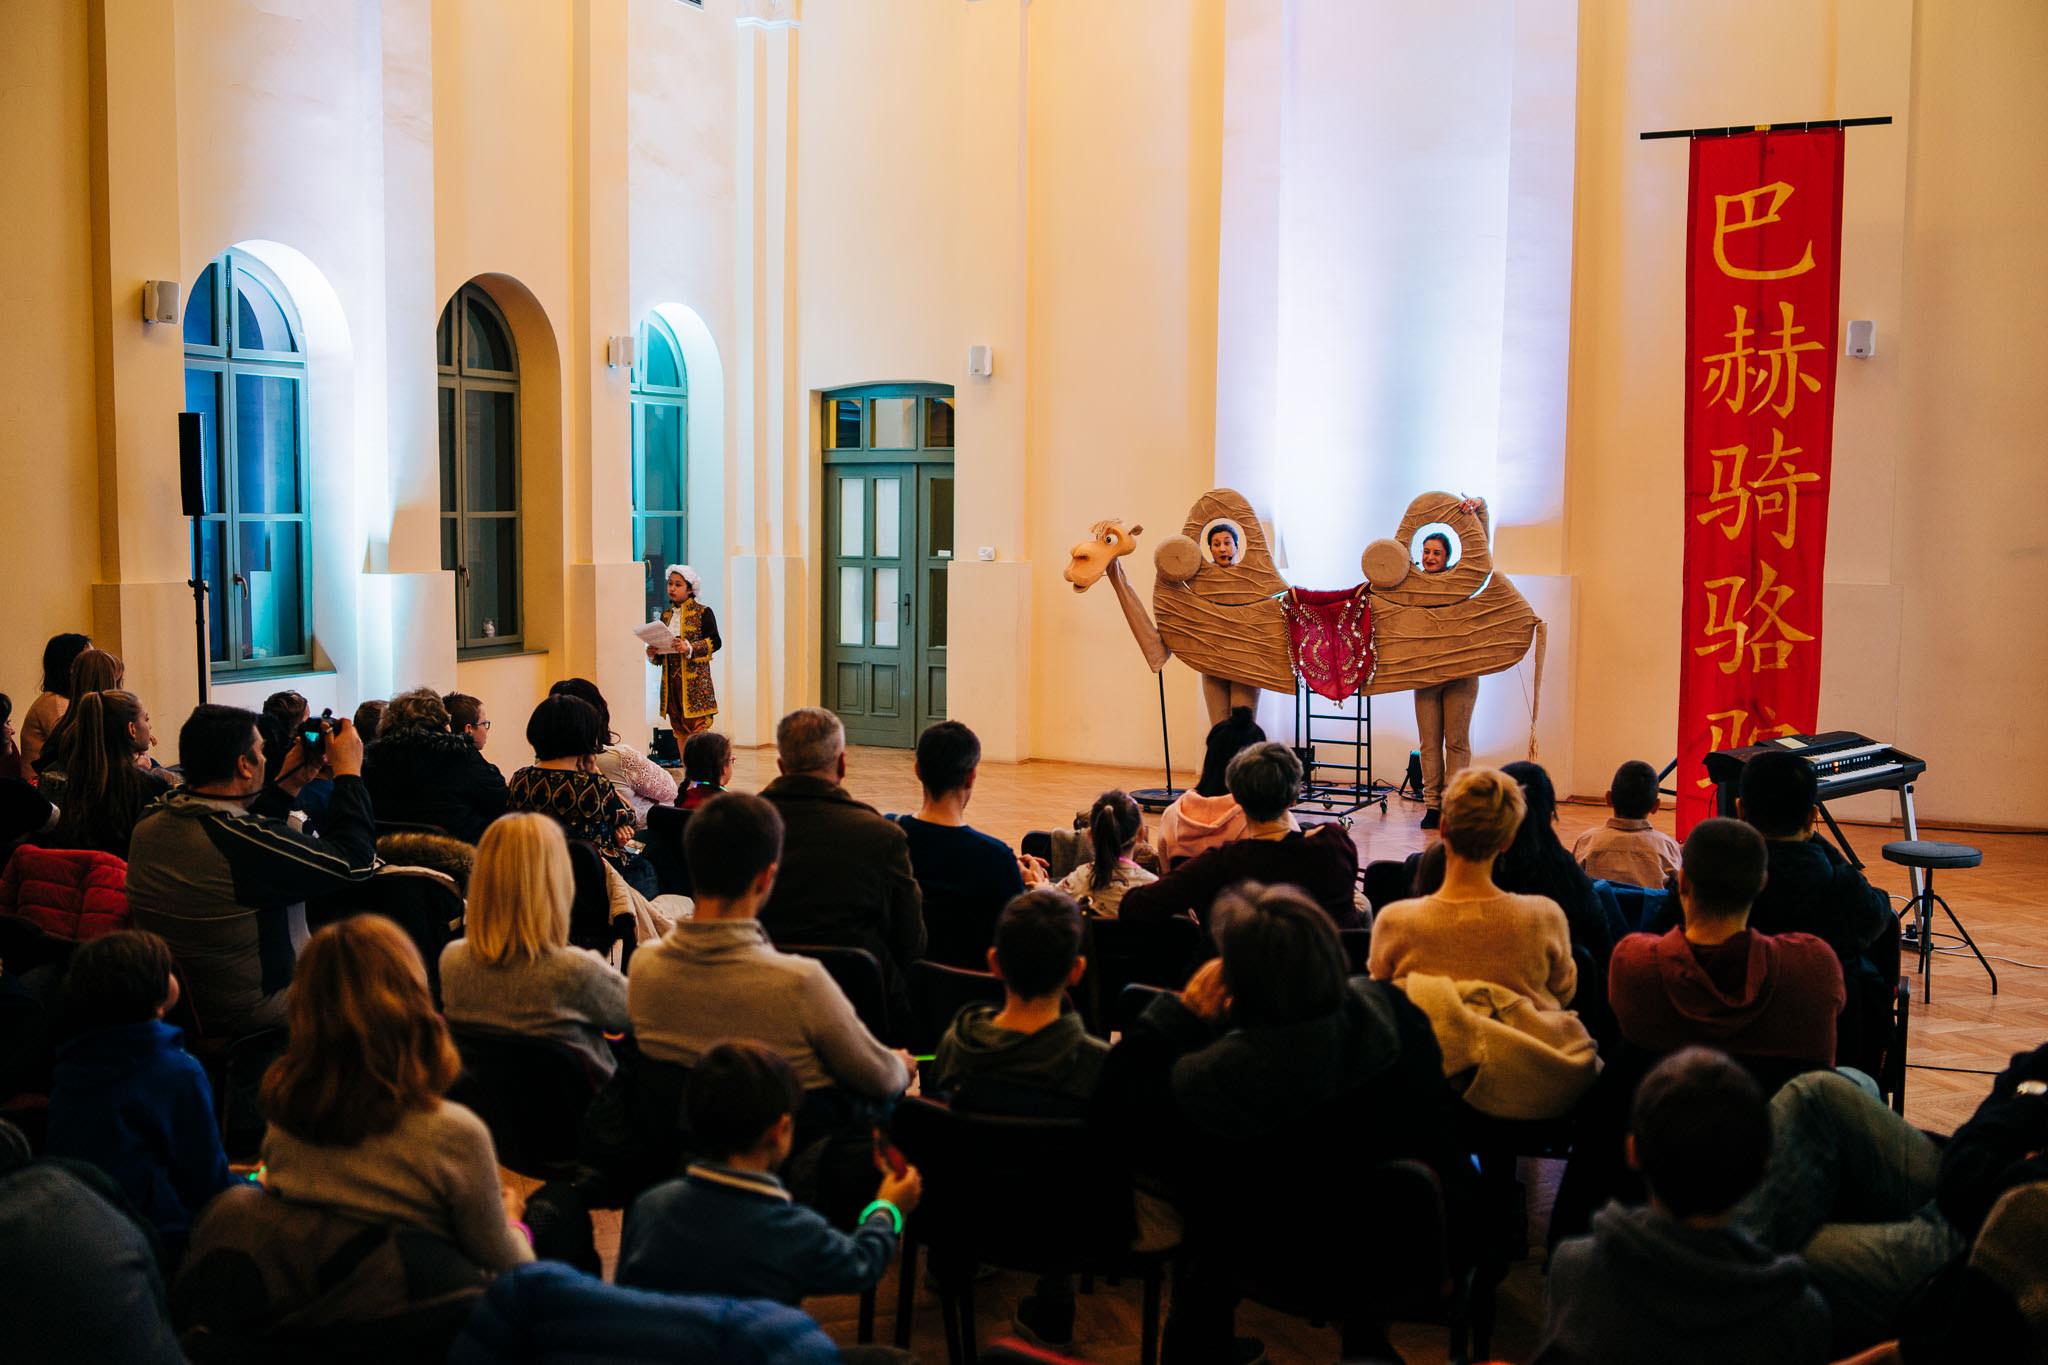 V Velickovic 31Dec87 Дочек 2019: Novi Sad omladinska prestonica kulture